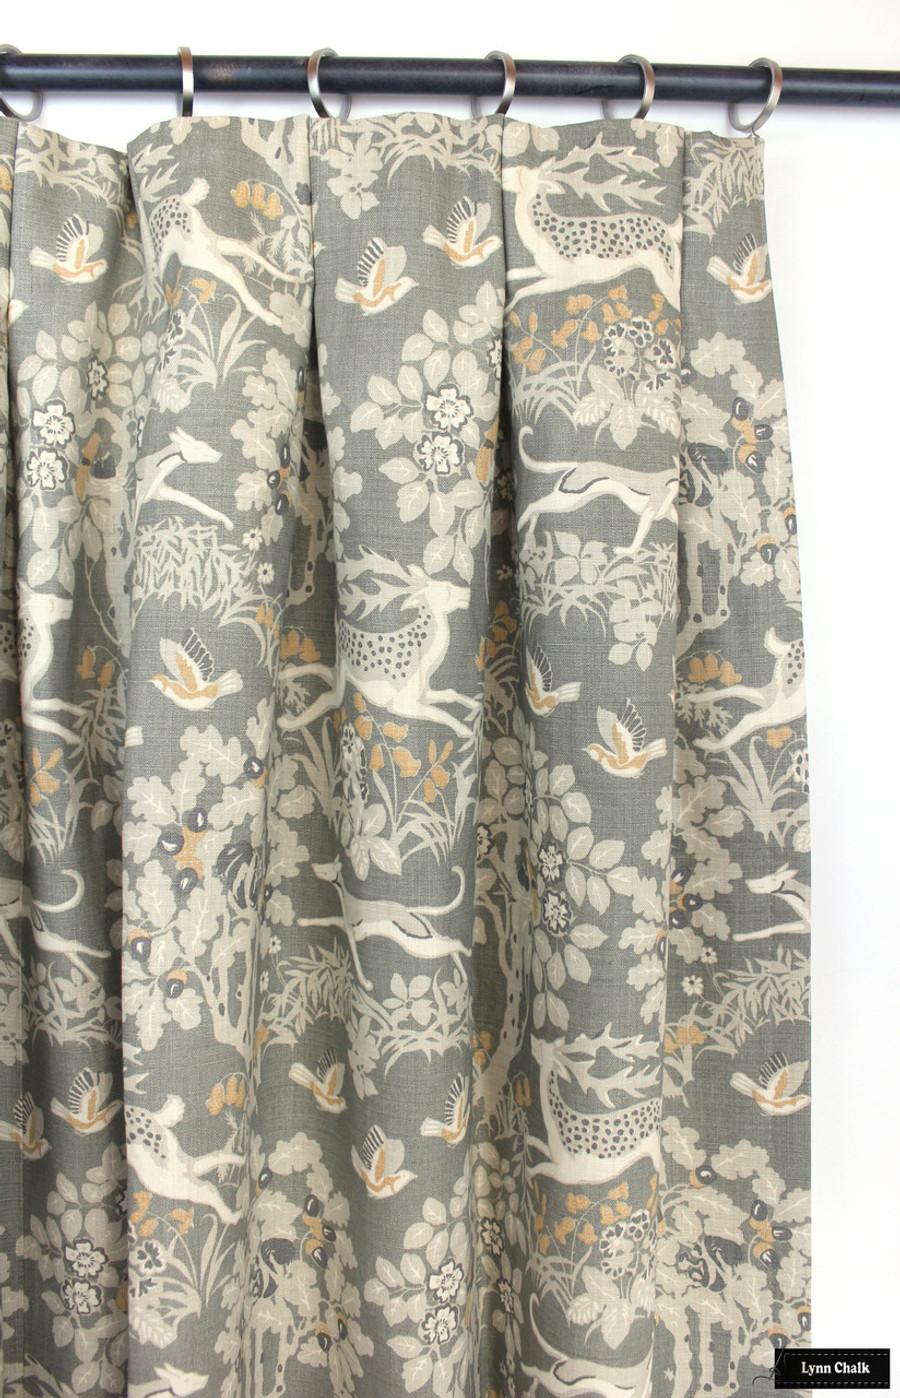 Kravet Lee Jofa Mille Fleur Custom Drapes (Shown in Silver-comes in 4 colors)